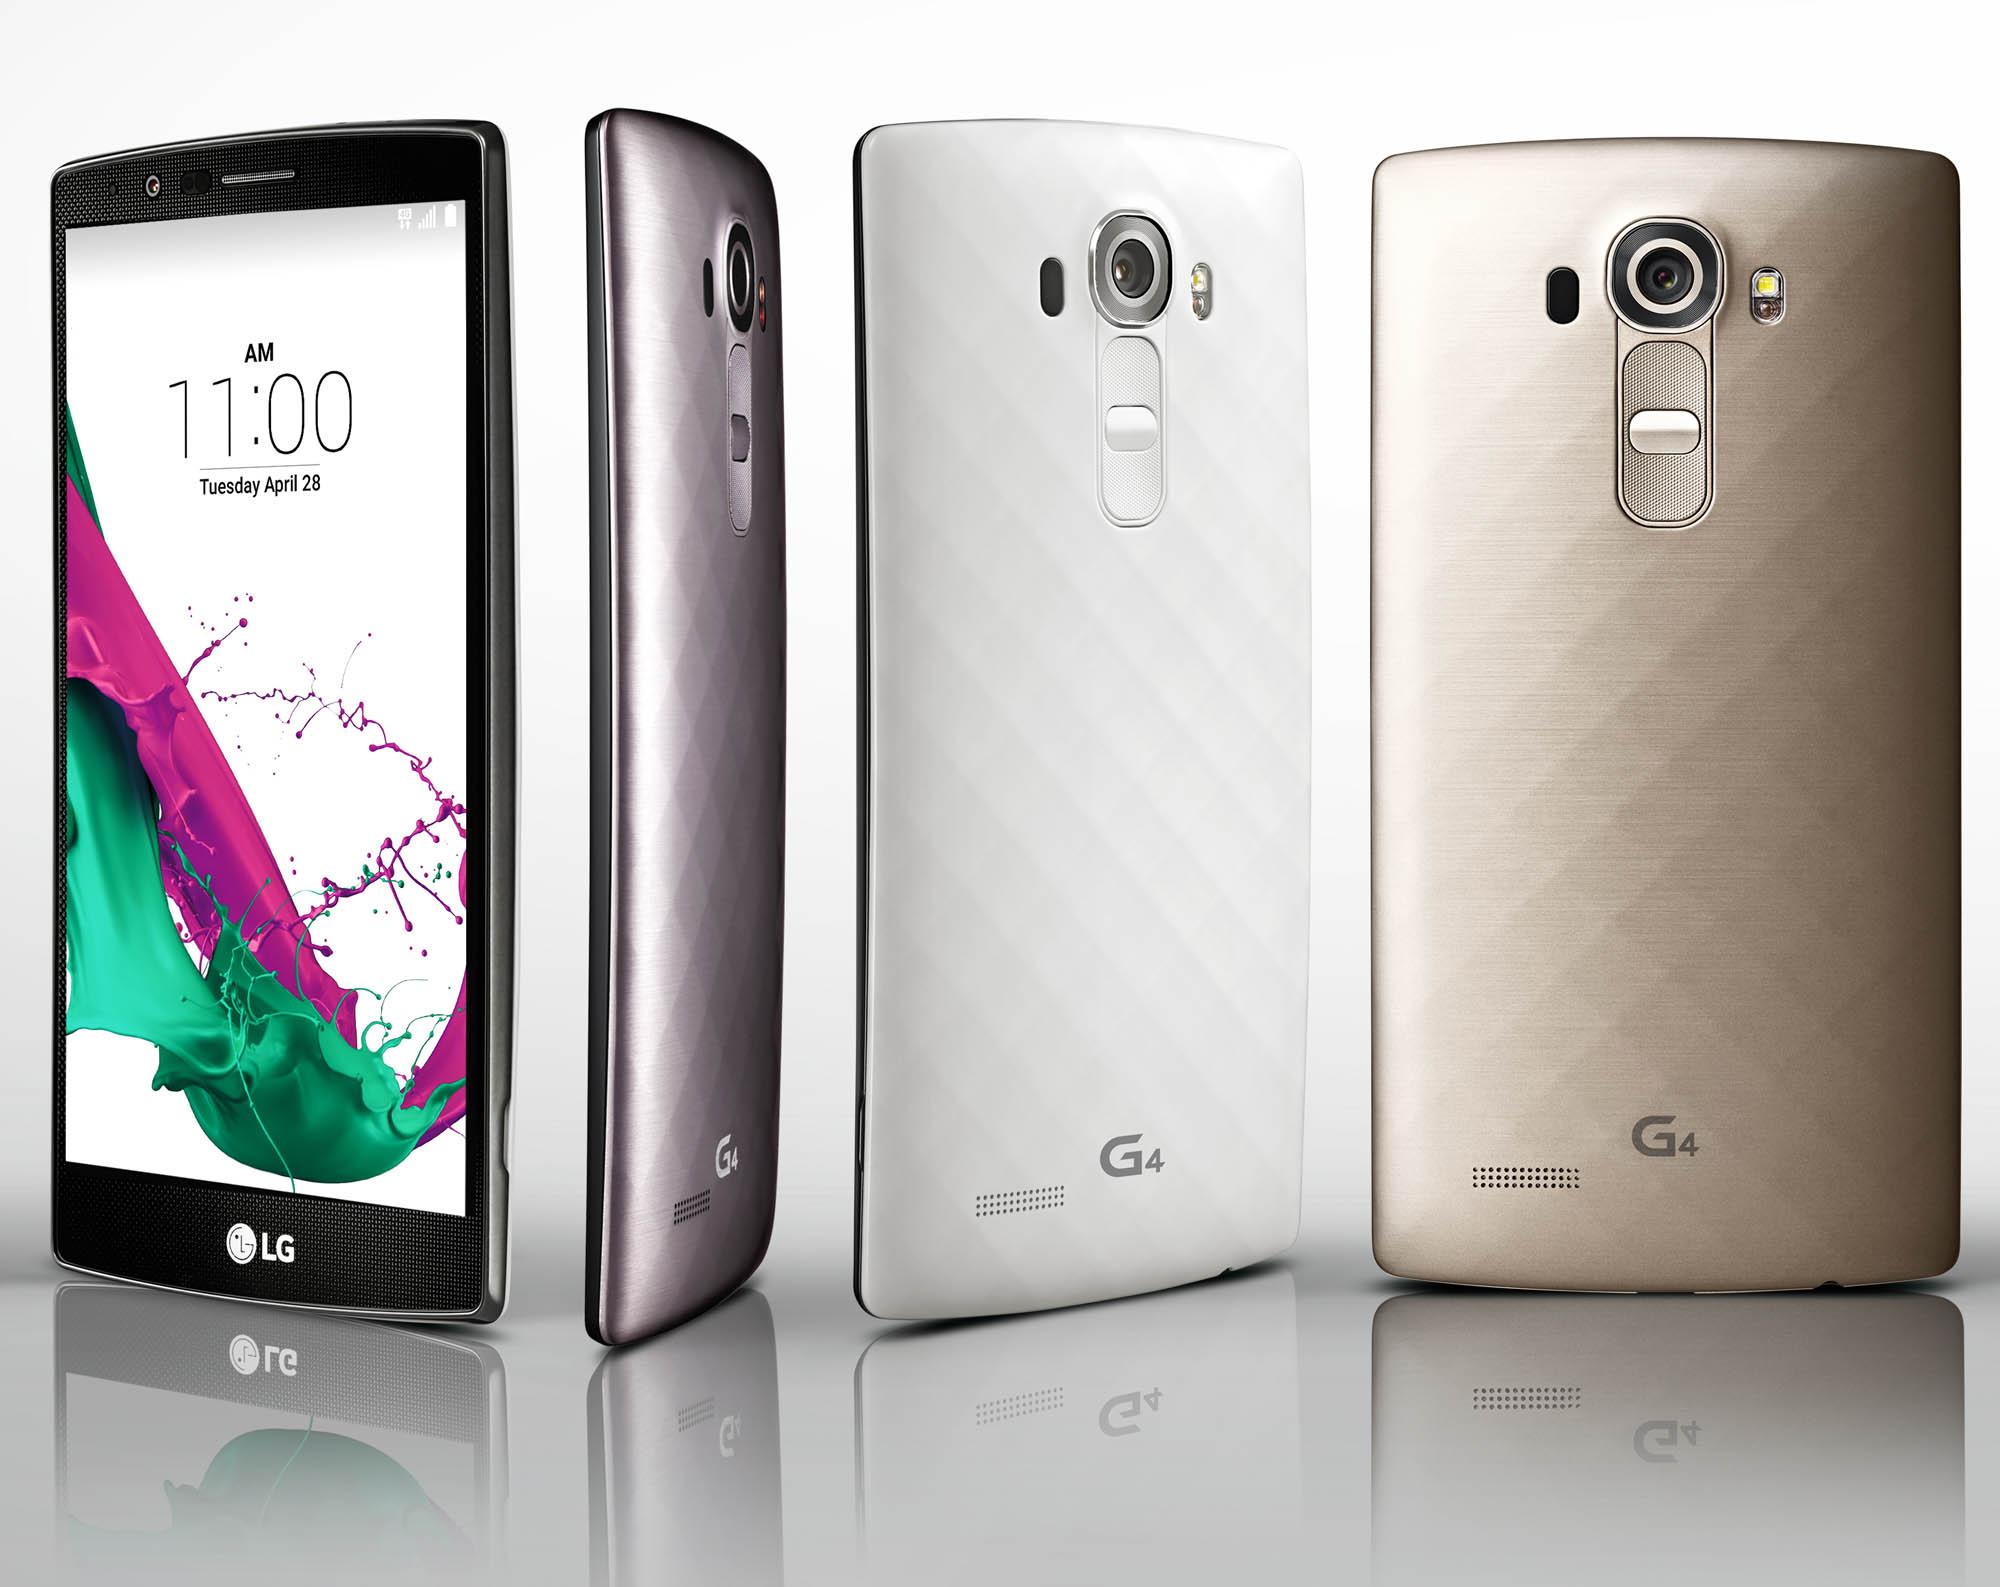 LG G4 - 2